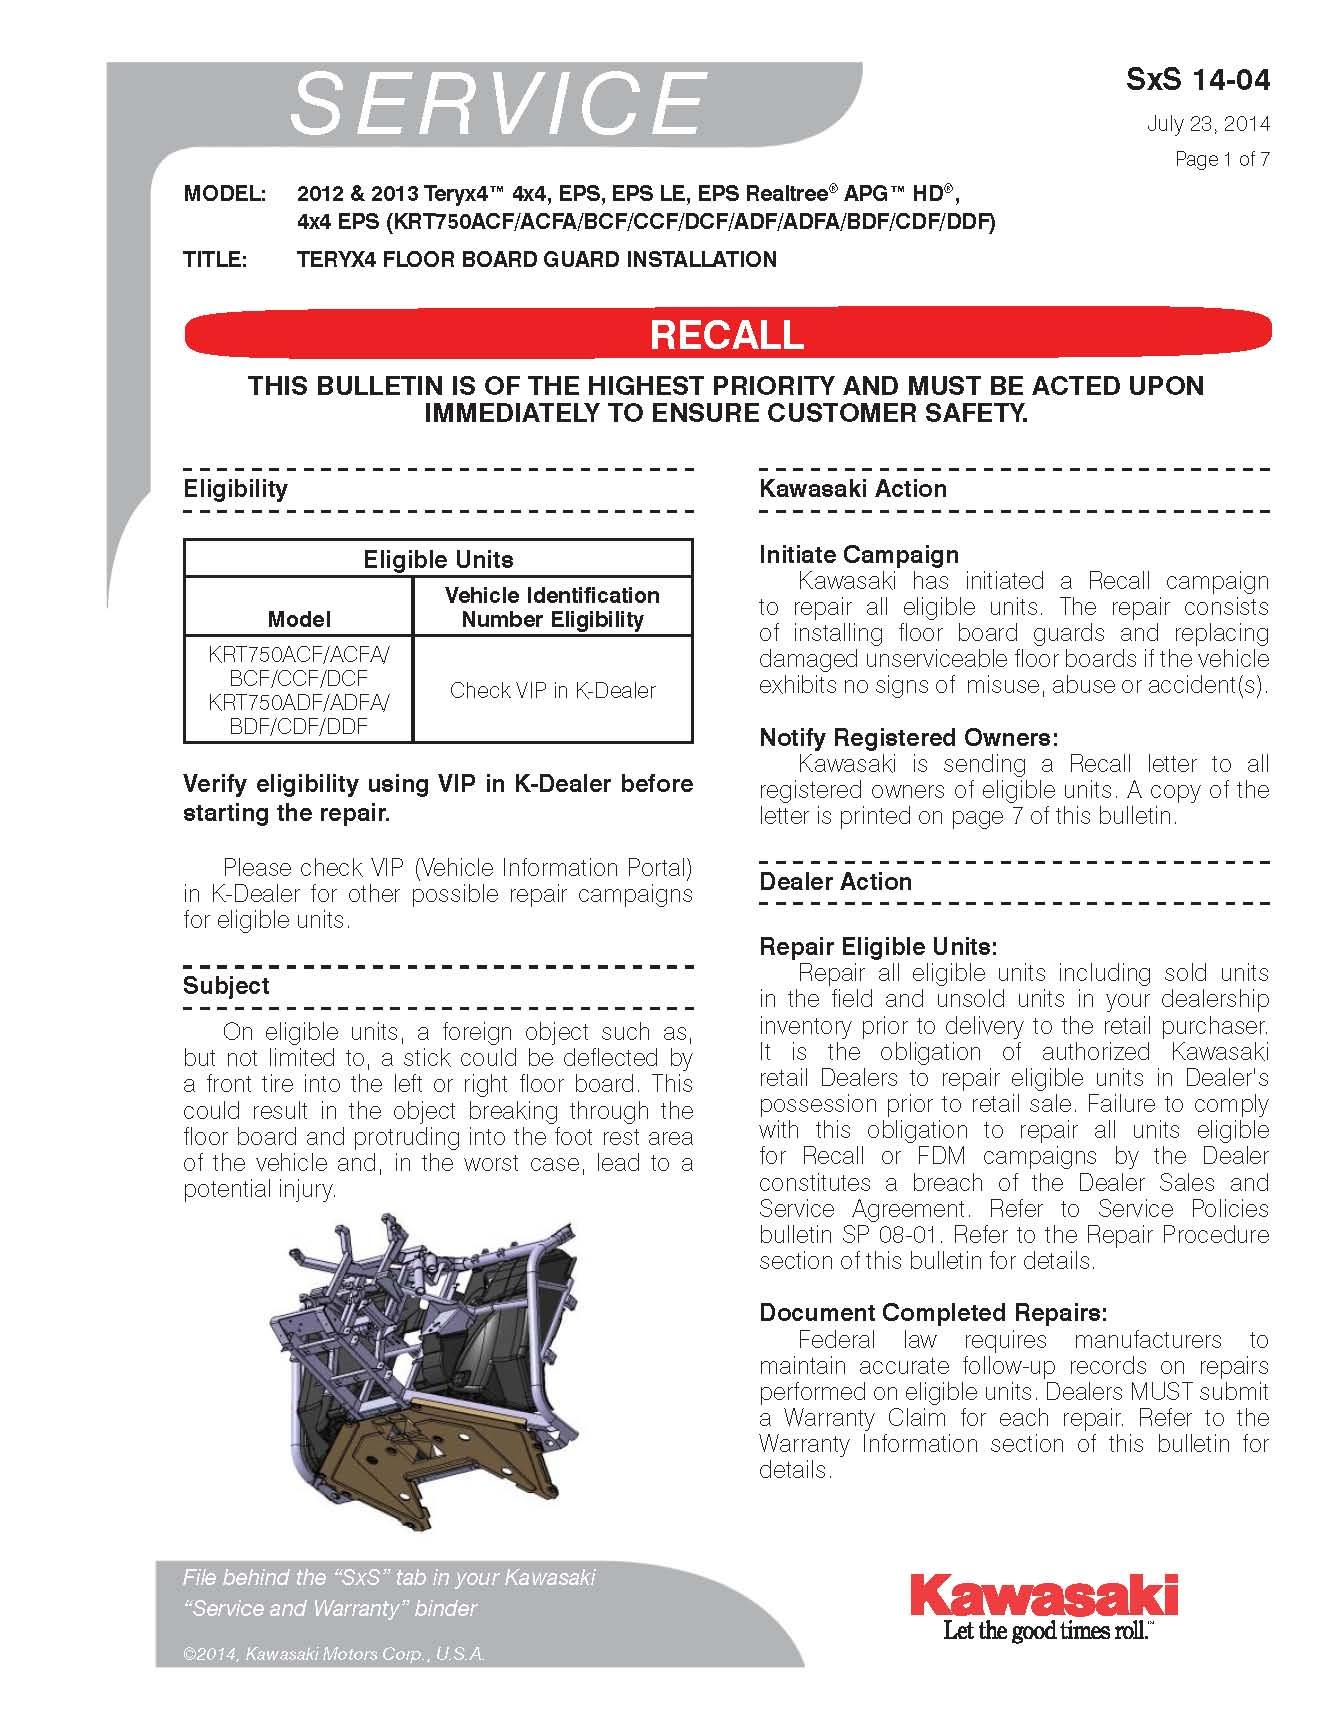 Kawasaki Teryx Recall